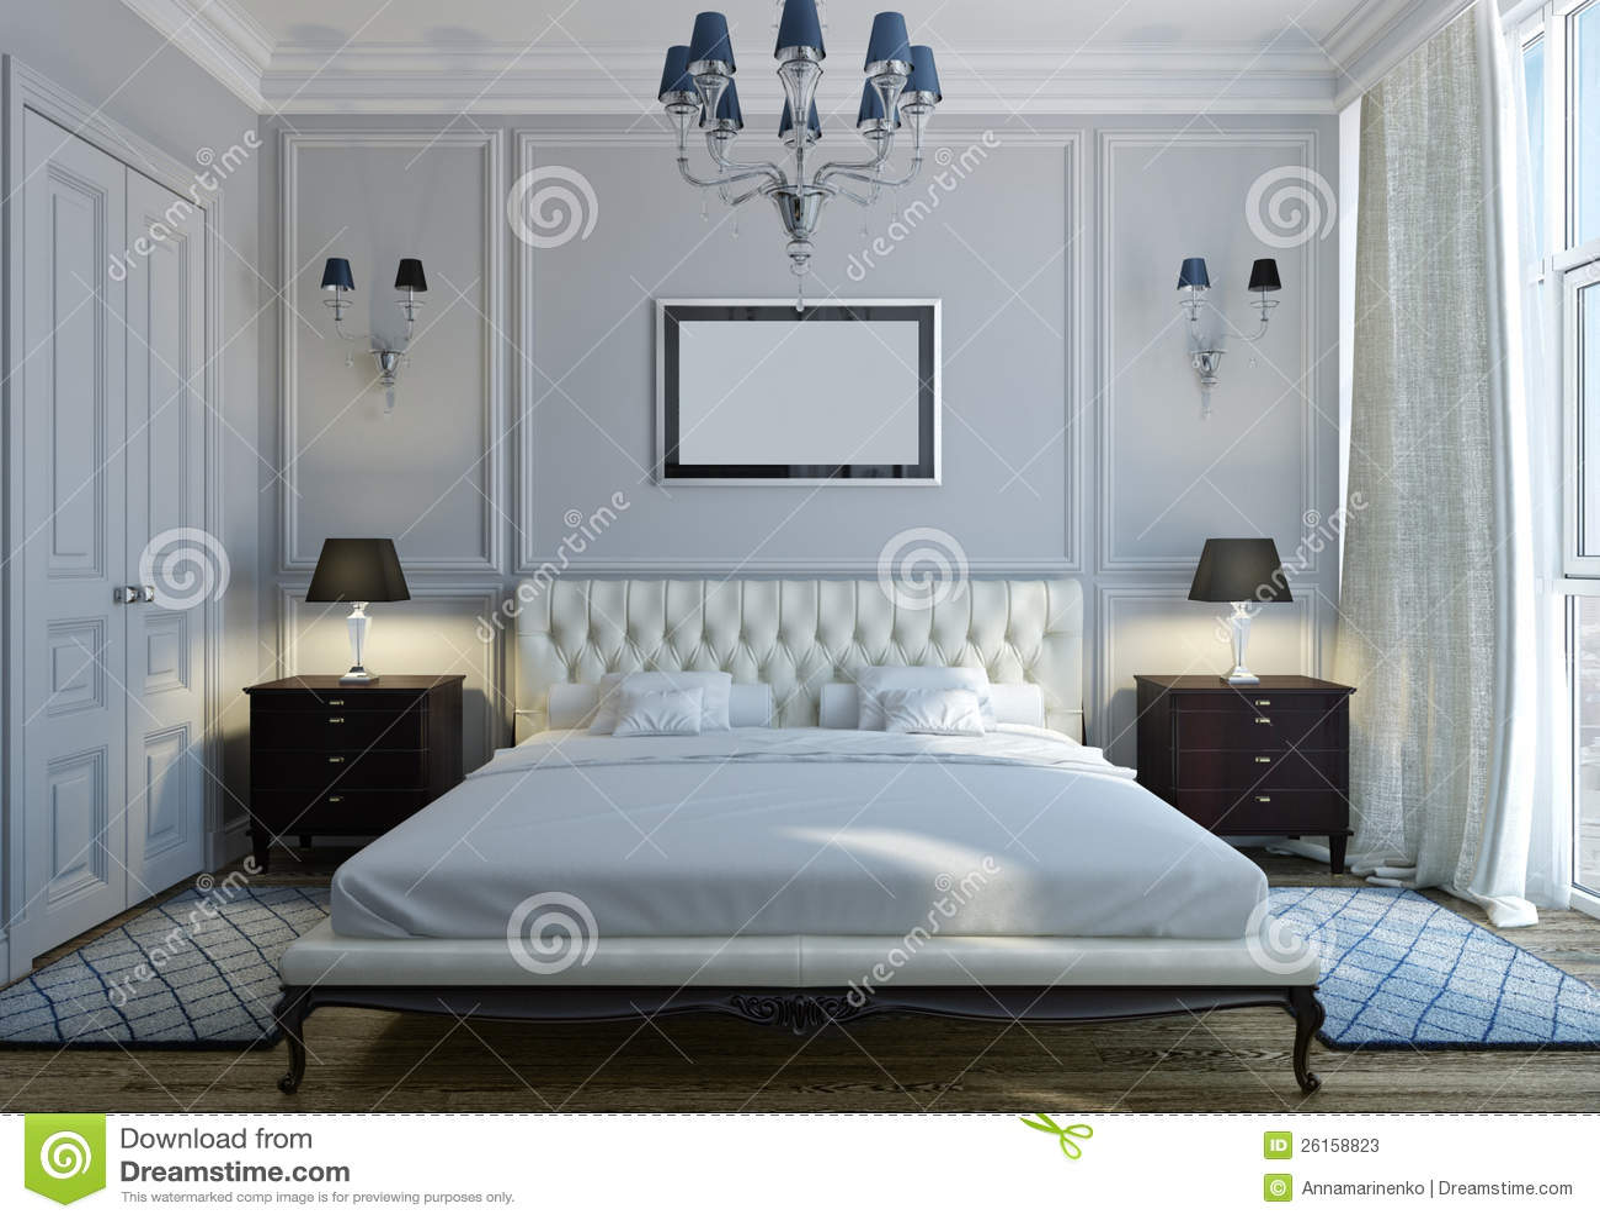 Chambre a coucher neo classique for Chambre a coucher classique moderne